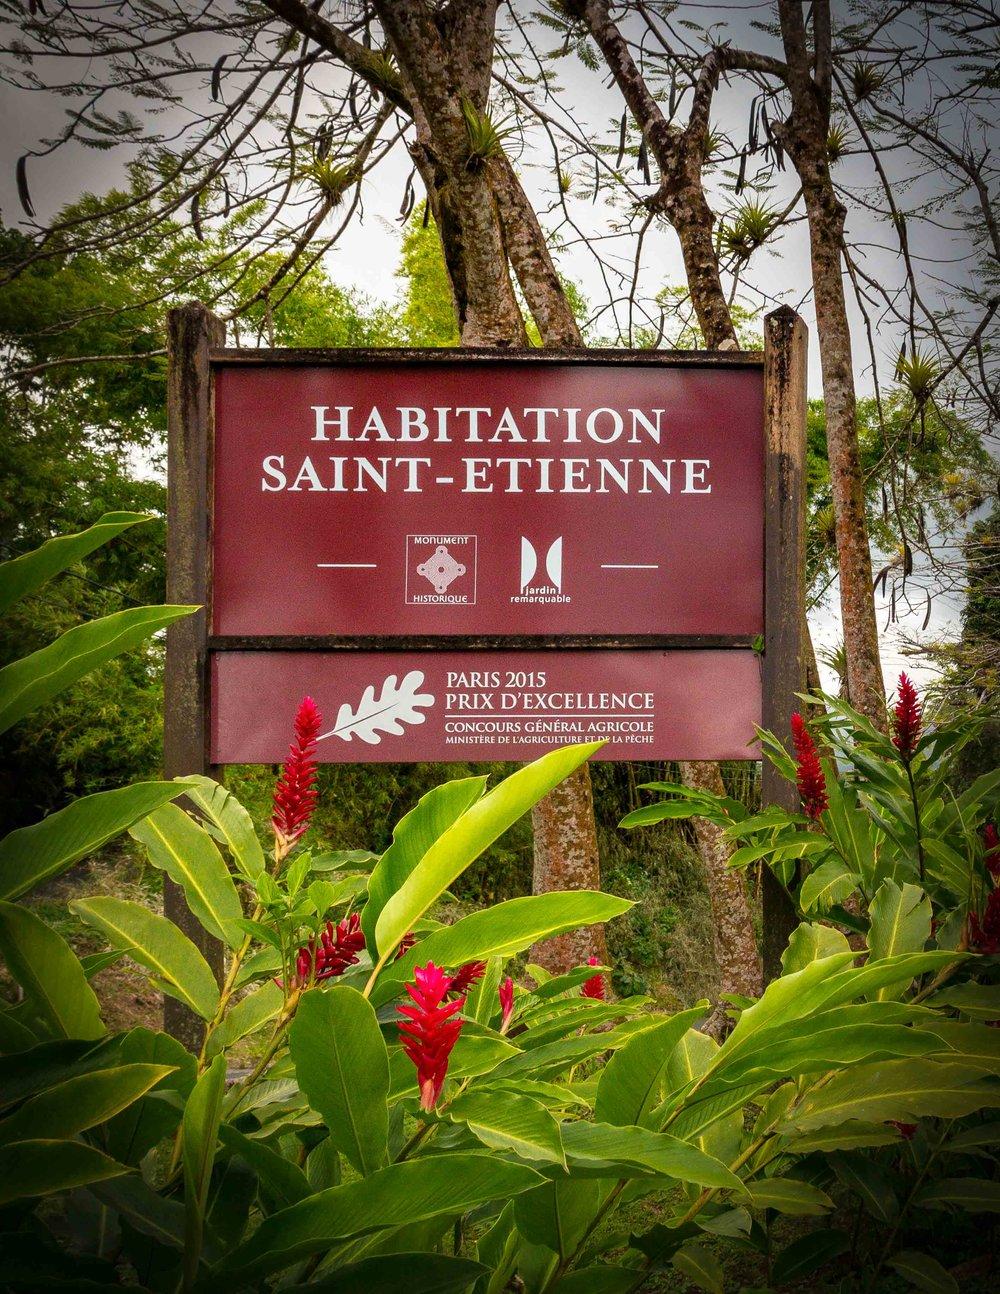 martinique_habitation_saint-etienne_3007.jpg